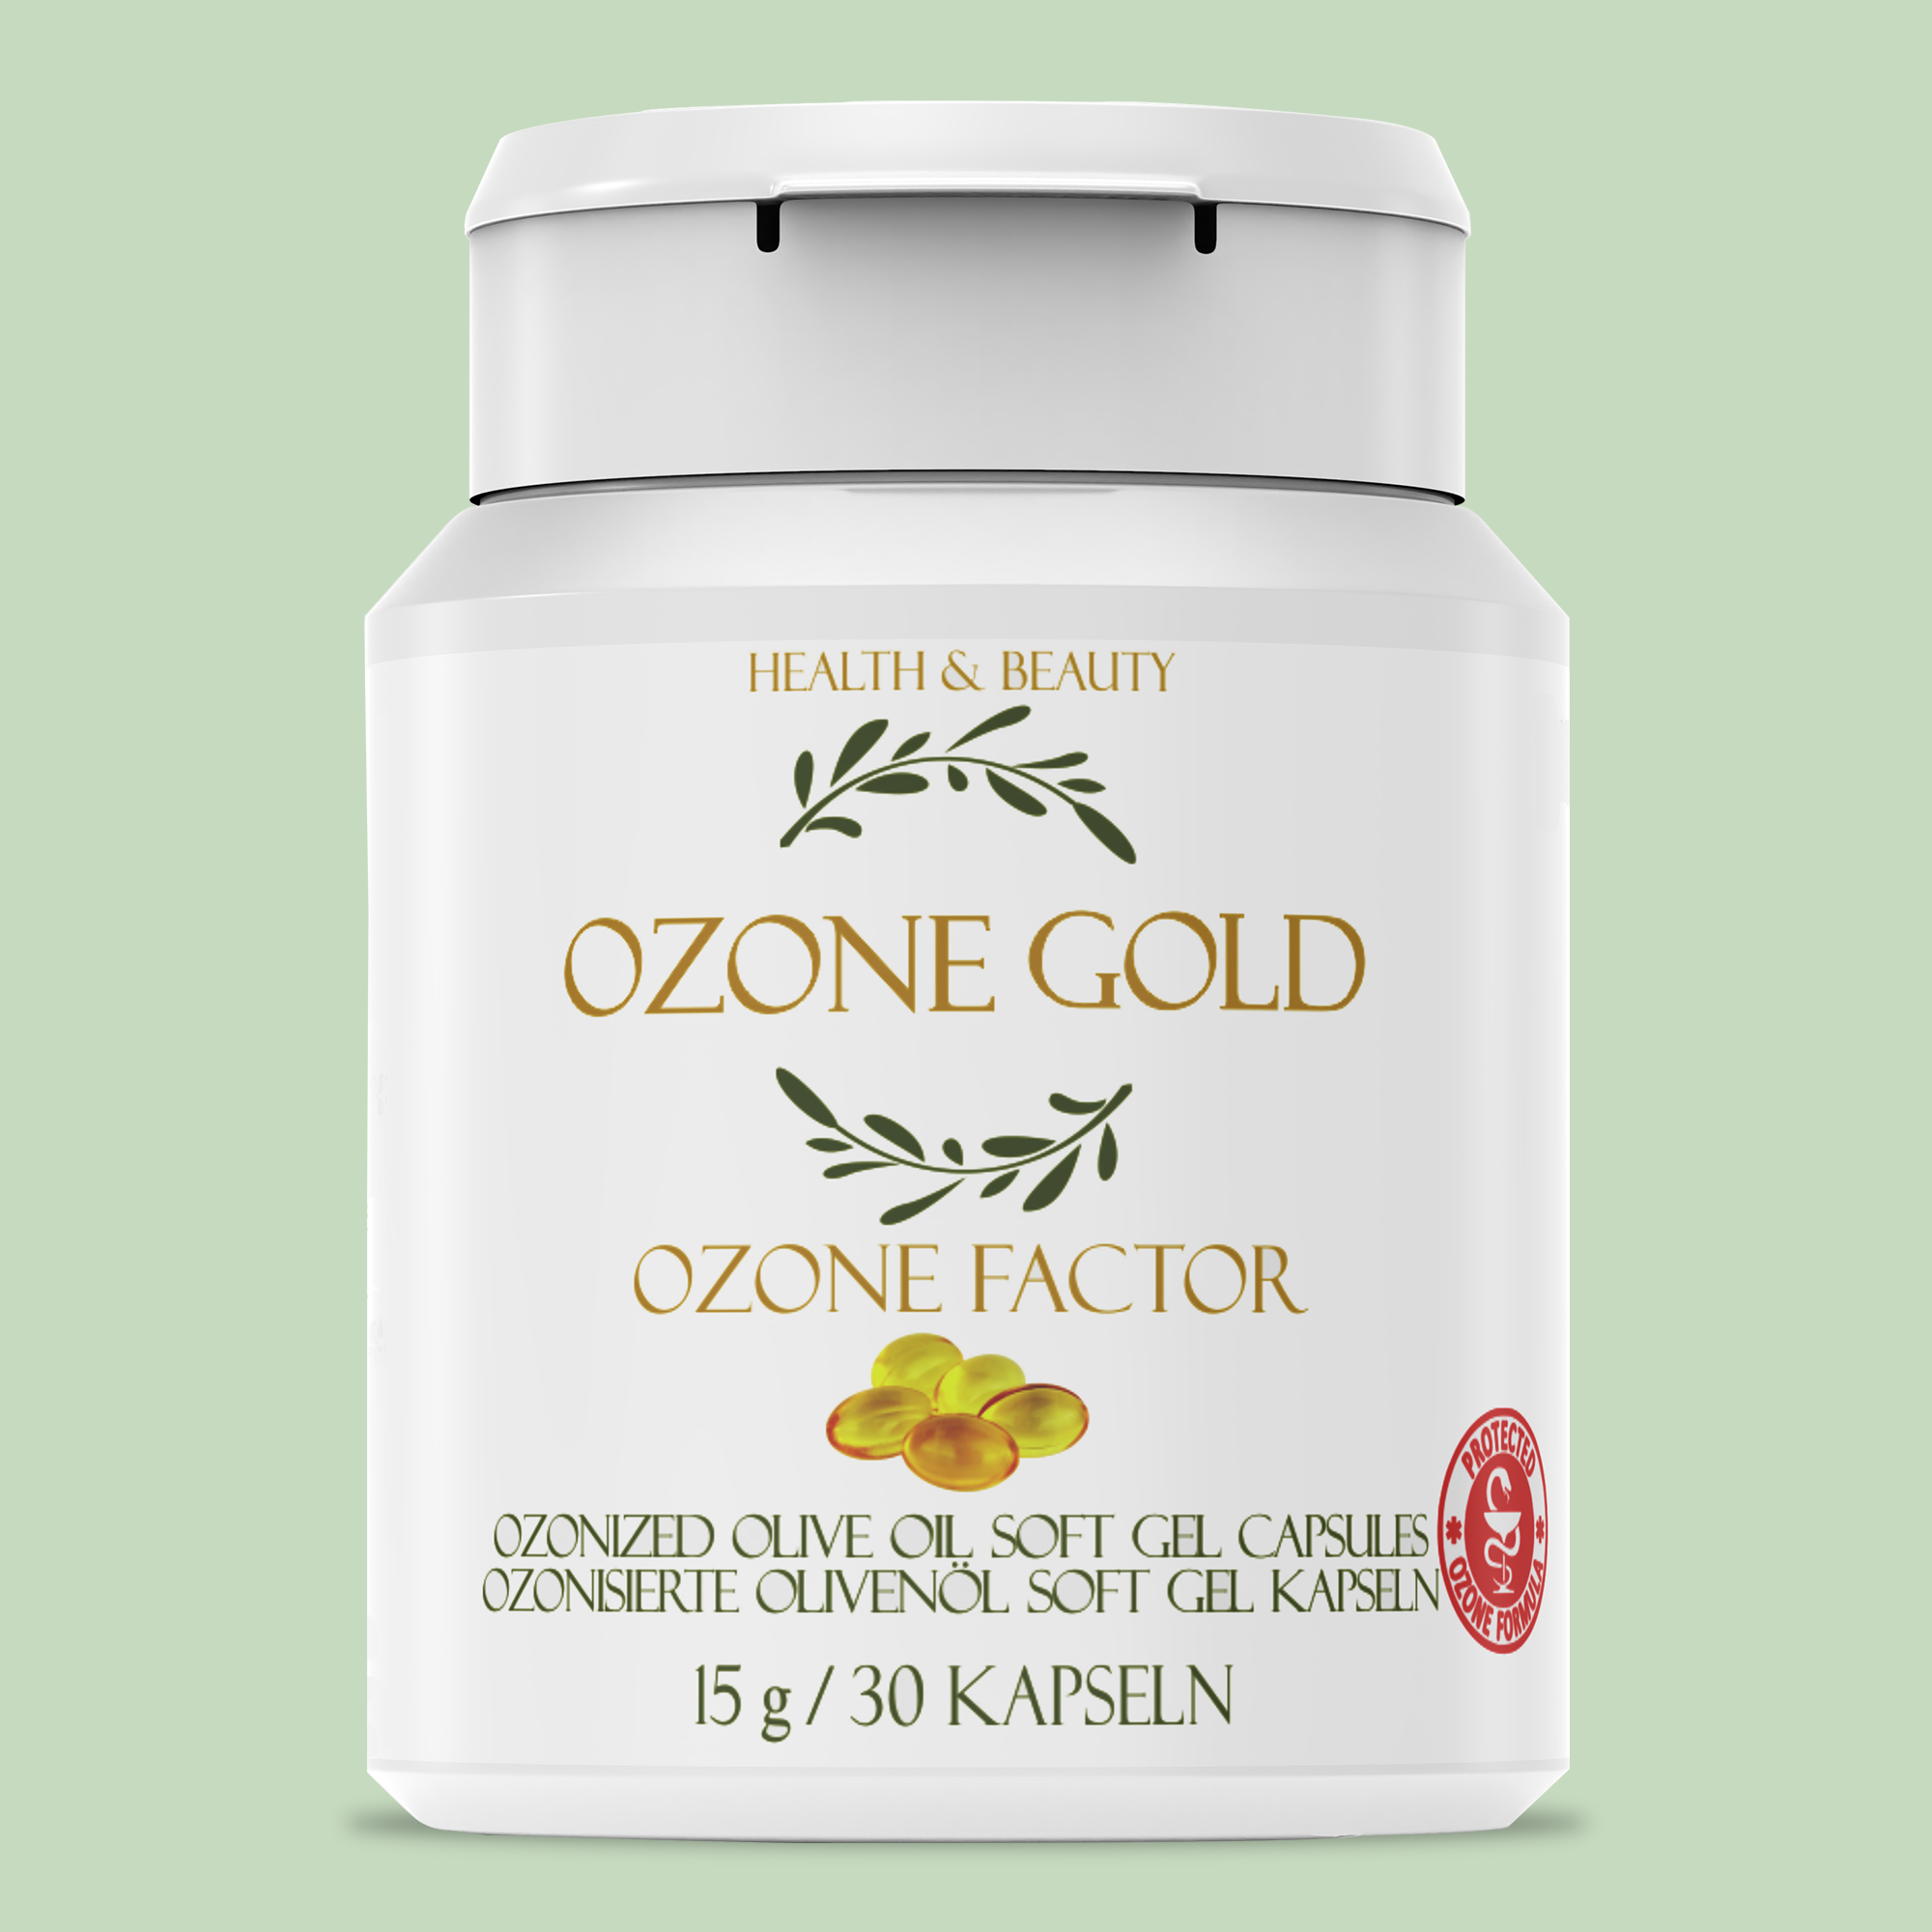 OF - OZONE GOLD